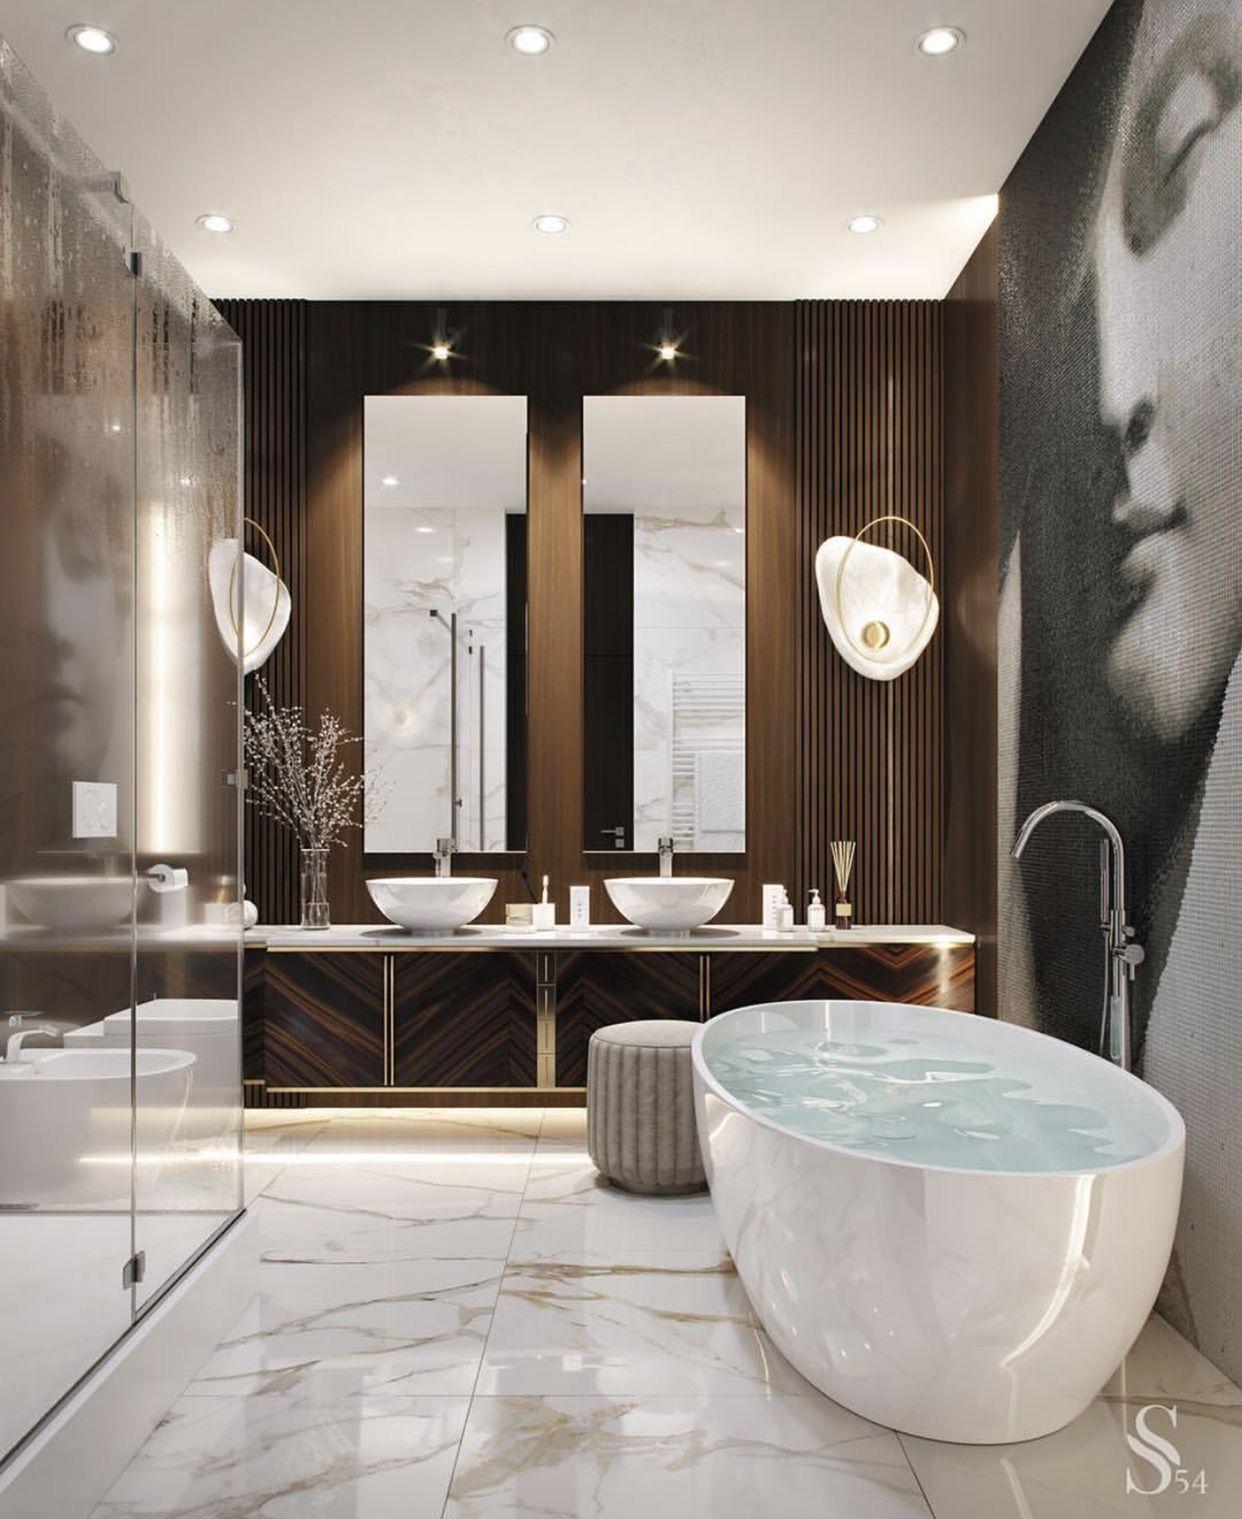 30 Glamorous Bathroom Design Ideas You Never Seen Before Glamorous Bathroom Luxury Bathroom Bathroom Interior